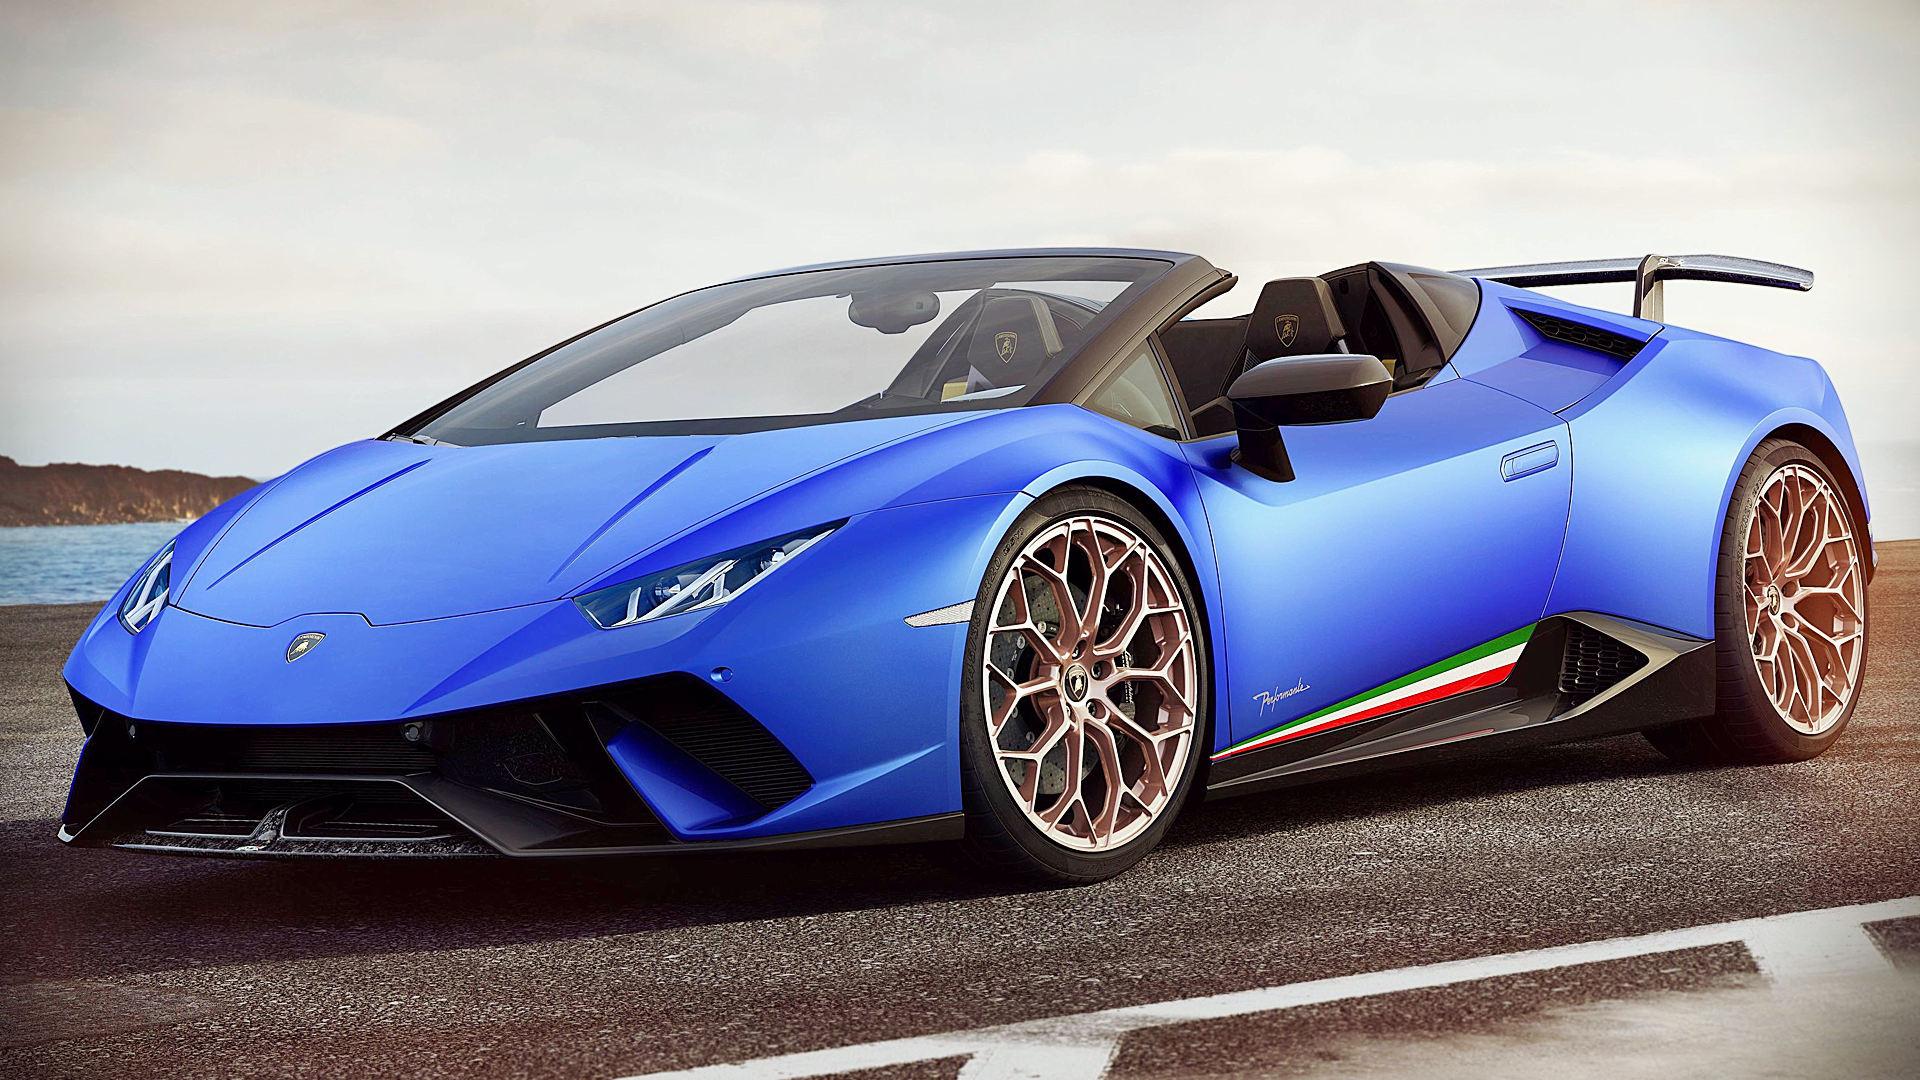 Lamborghini Huracan Performante Spyder 2019